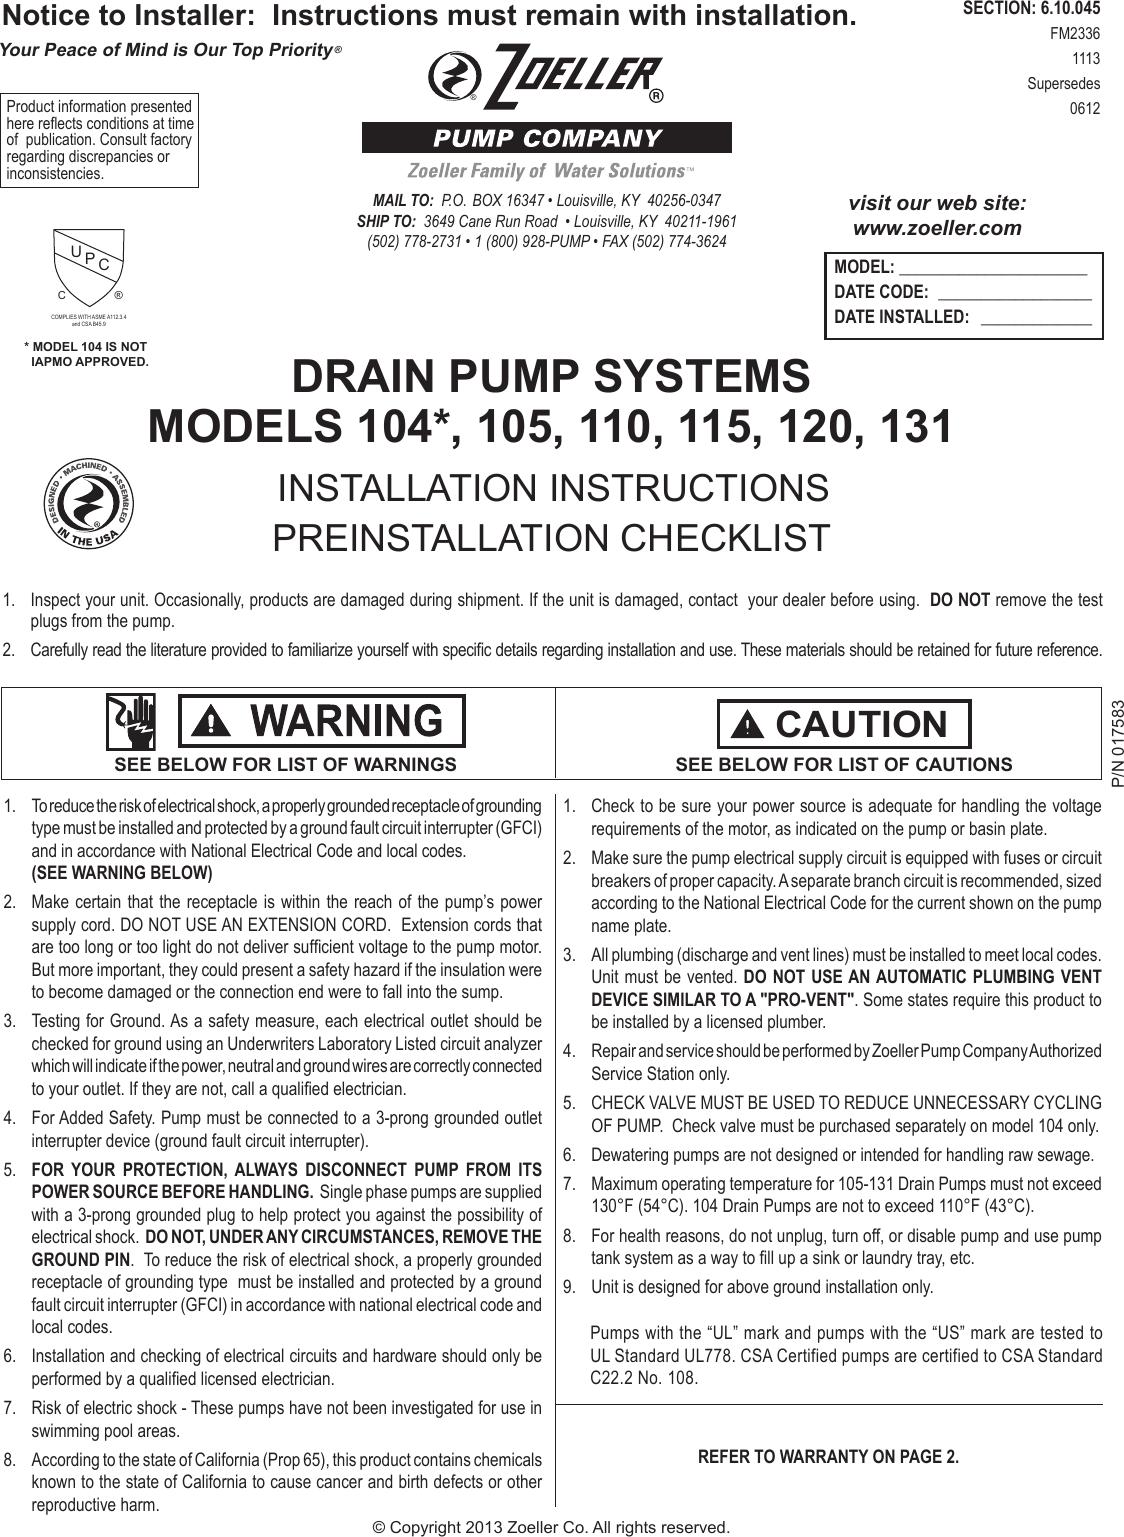 Zoeller Drain Pump 105 Manual Submersible Wiring Diagram 2740 2 Series Instructions User